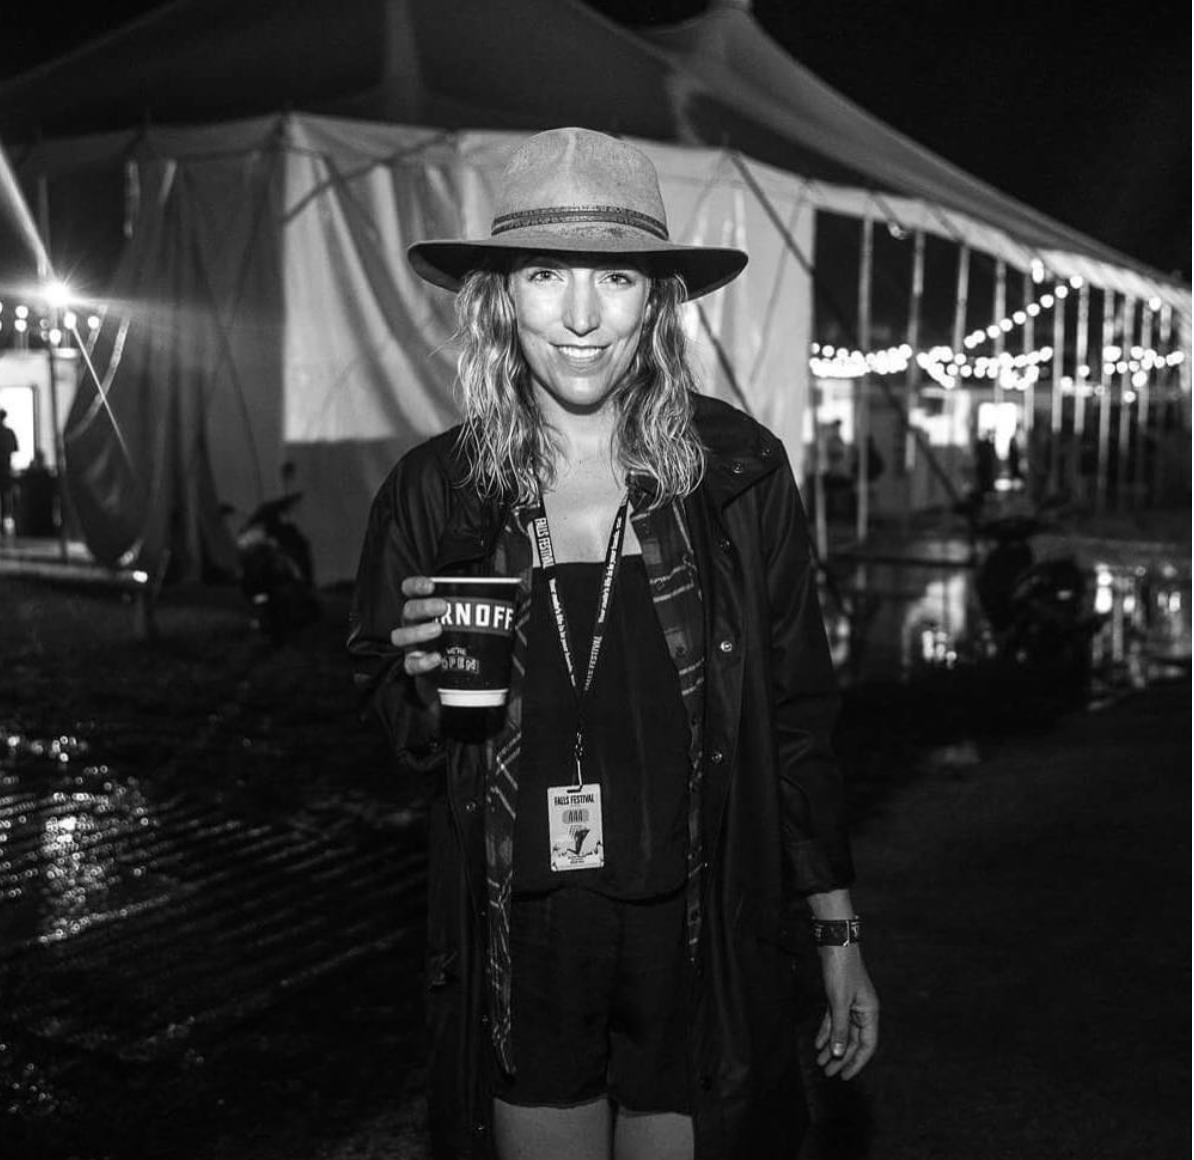 Ellen wearing her production hat for Secret Sounds at Falls Festival. Photo credit  @yayastemp